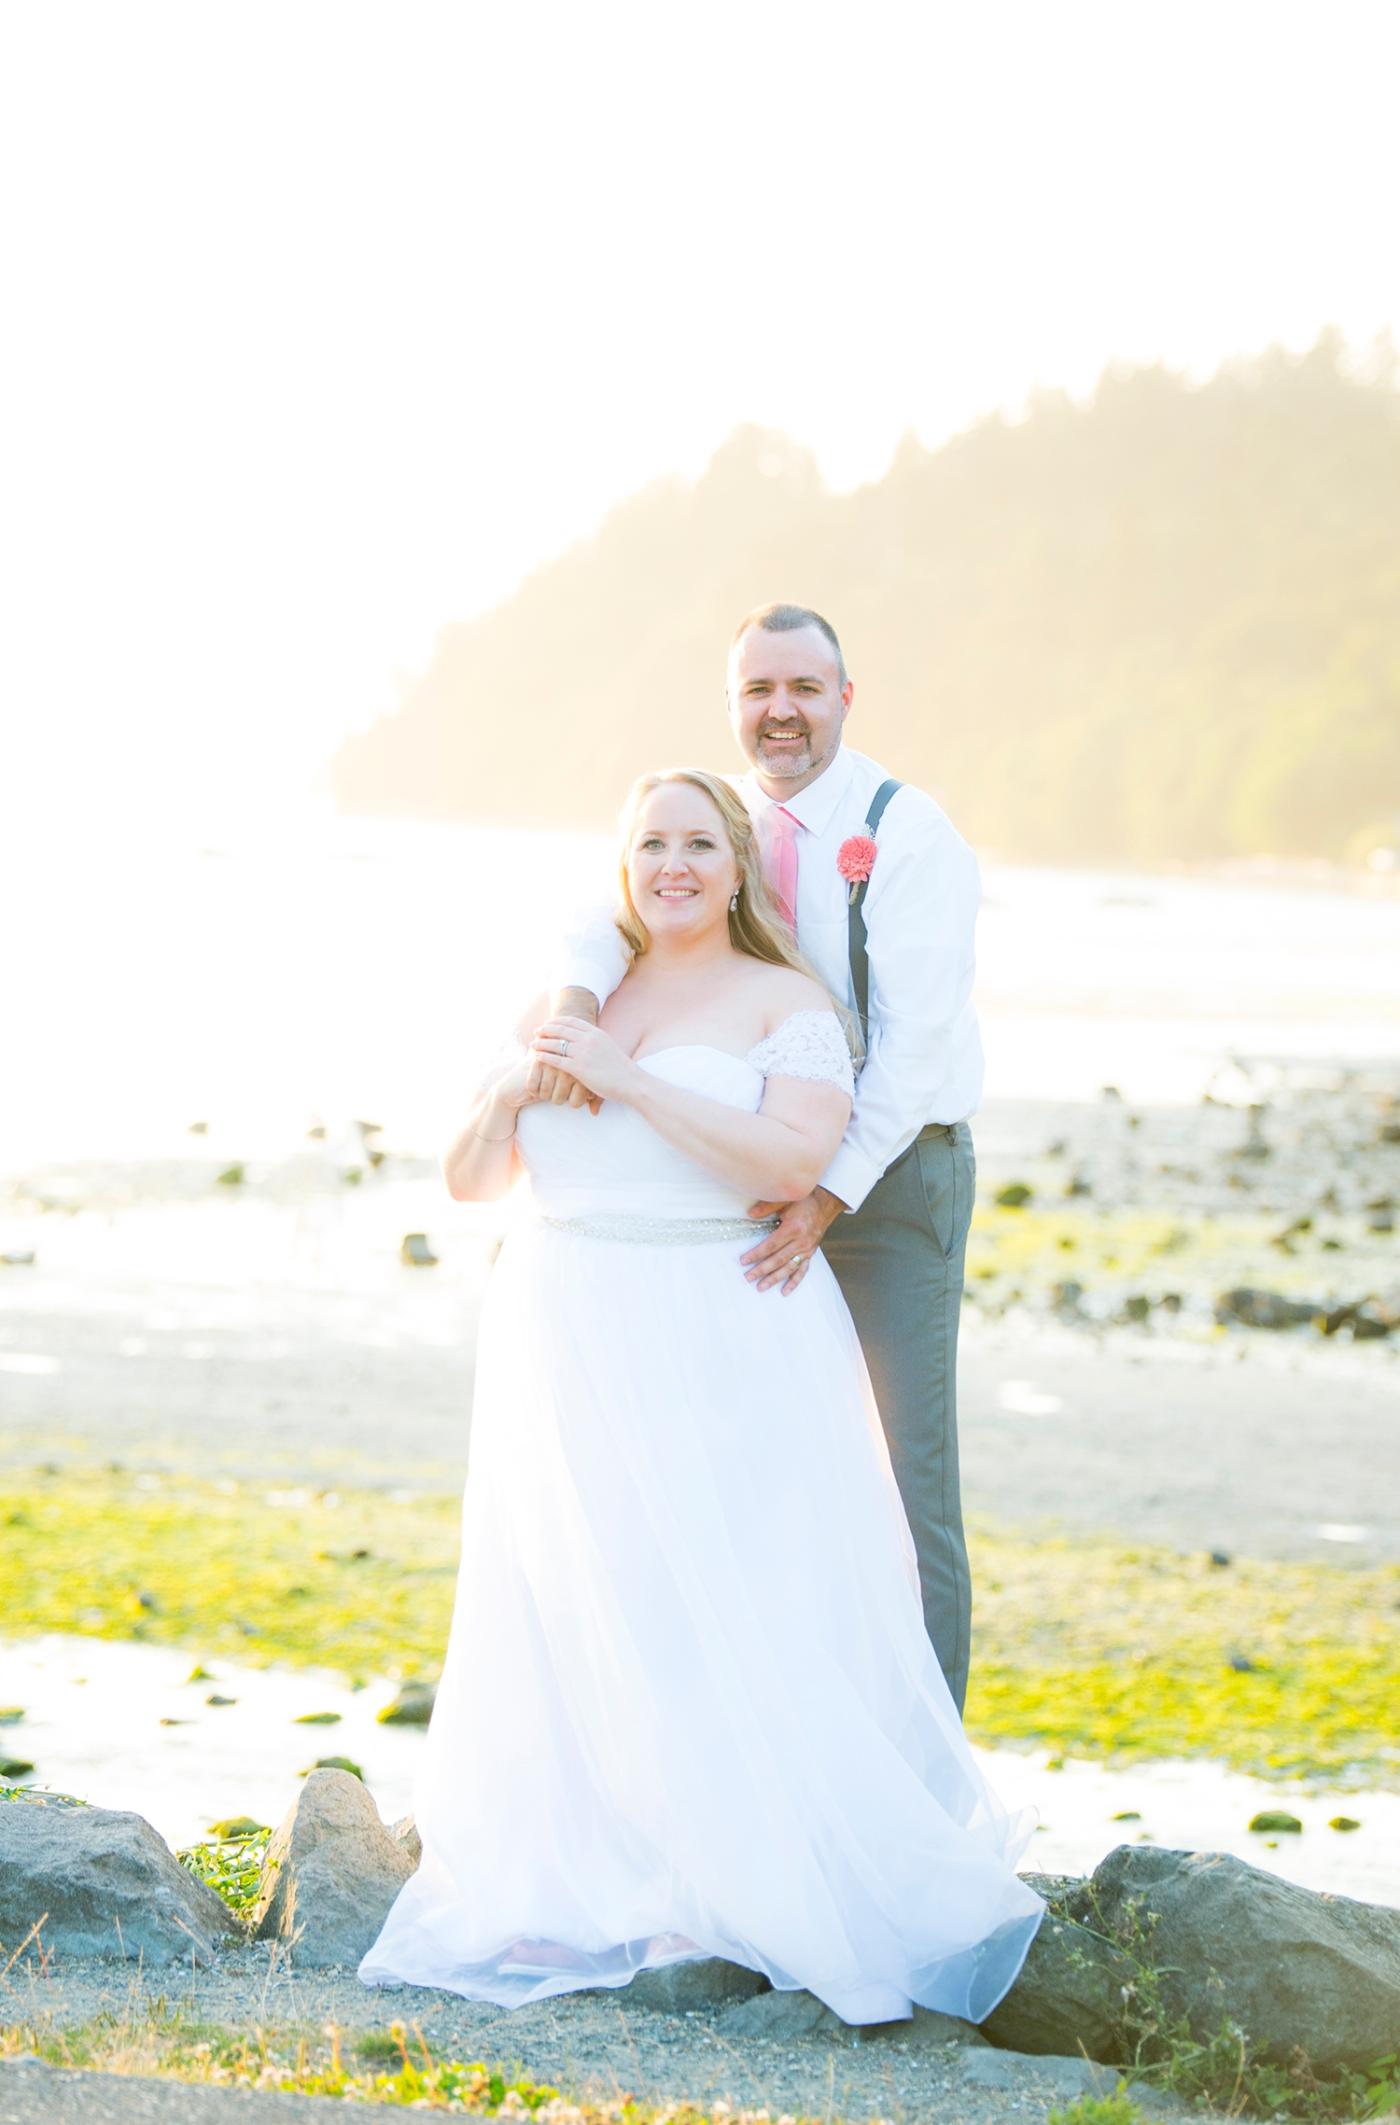 Jane_Speleers_photography_Kadie_and_Steve_2016_Des_Moines_Marina_WeddingDSC_2368